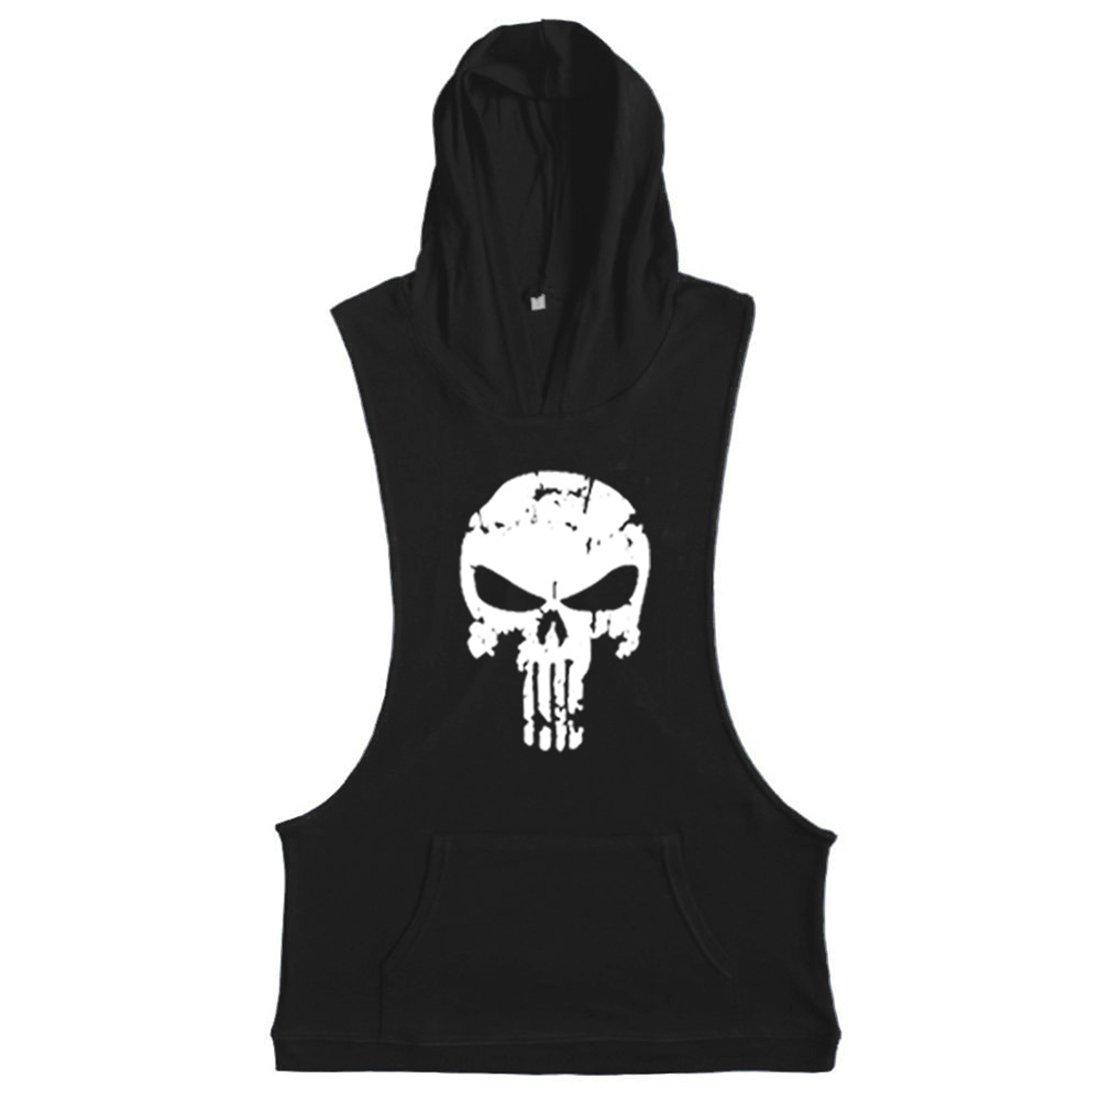 YeeHoo Herren Unterhemd Stringer Skull Bodybuilding Fitness Gym Tank Top Sport Hemd Weste mit Kapuze